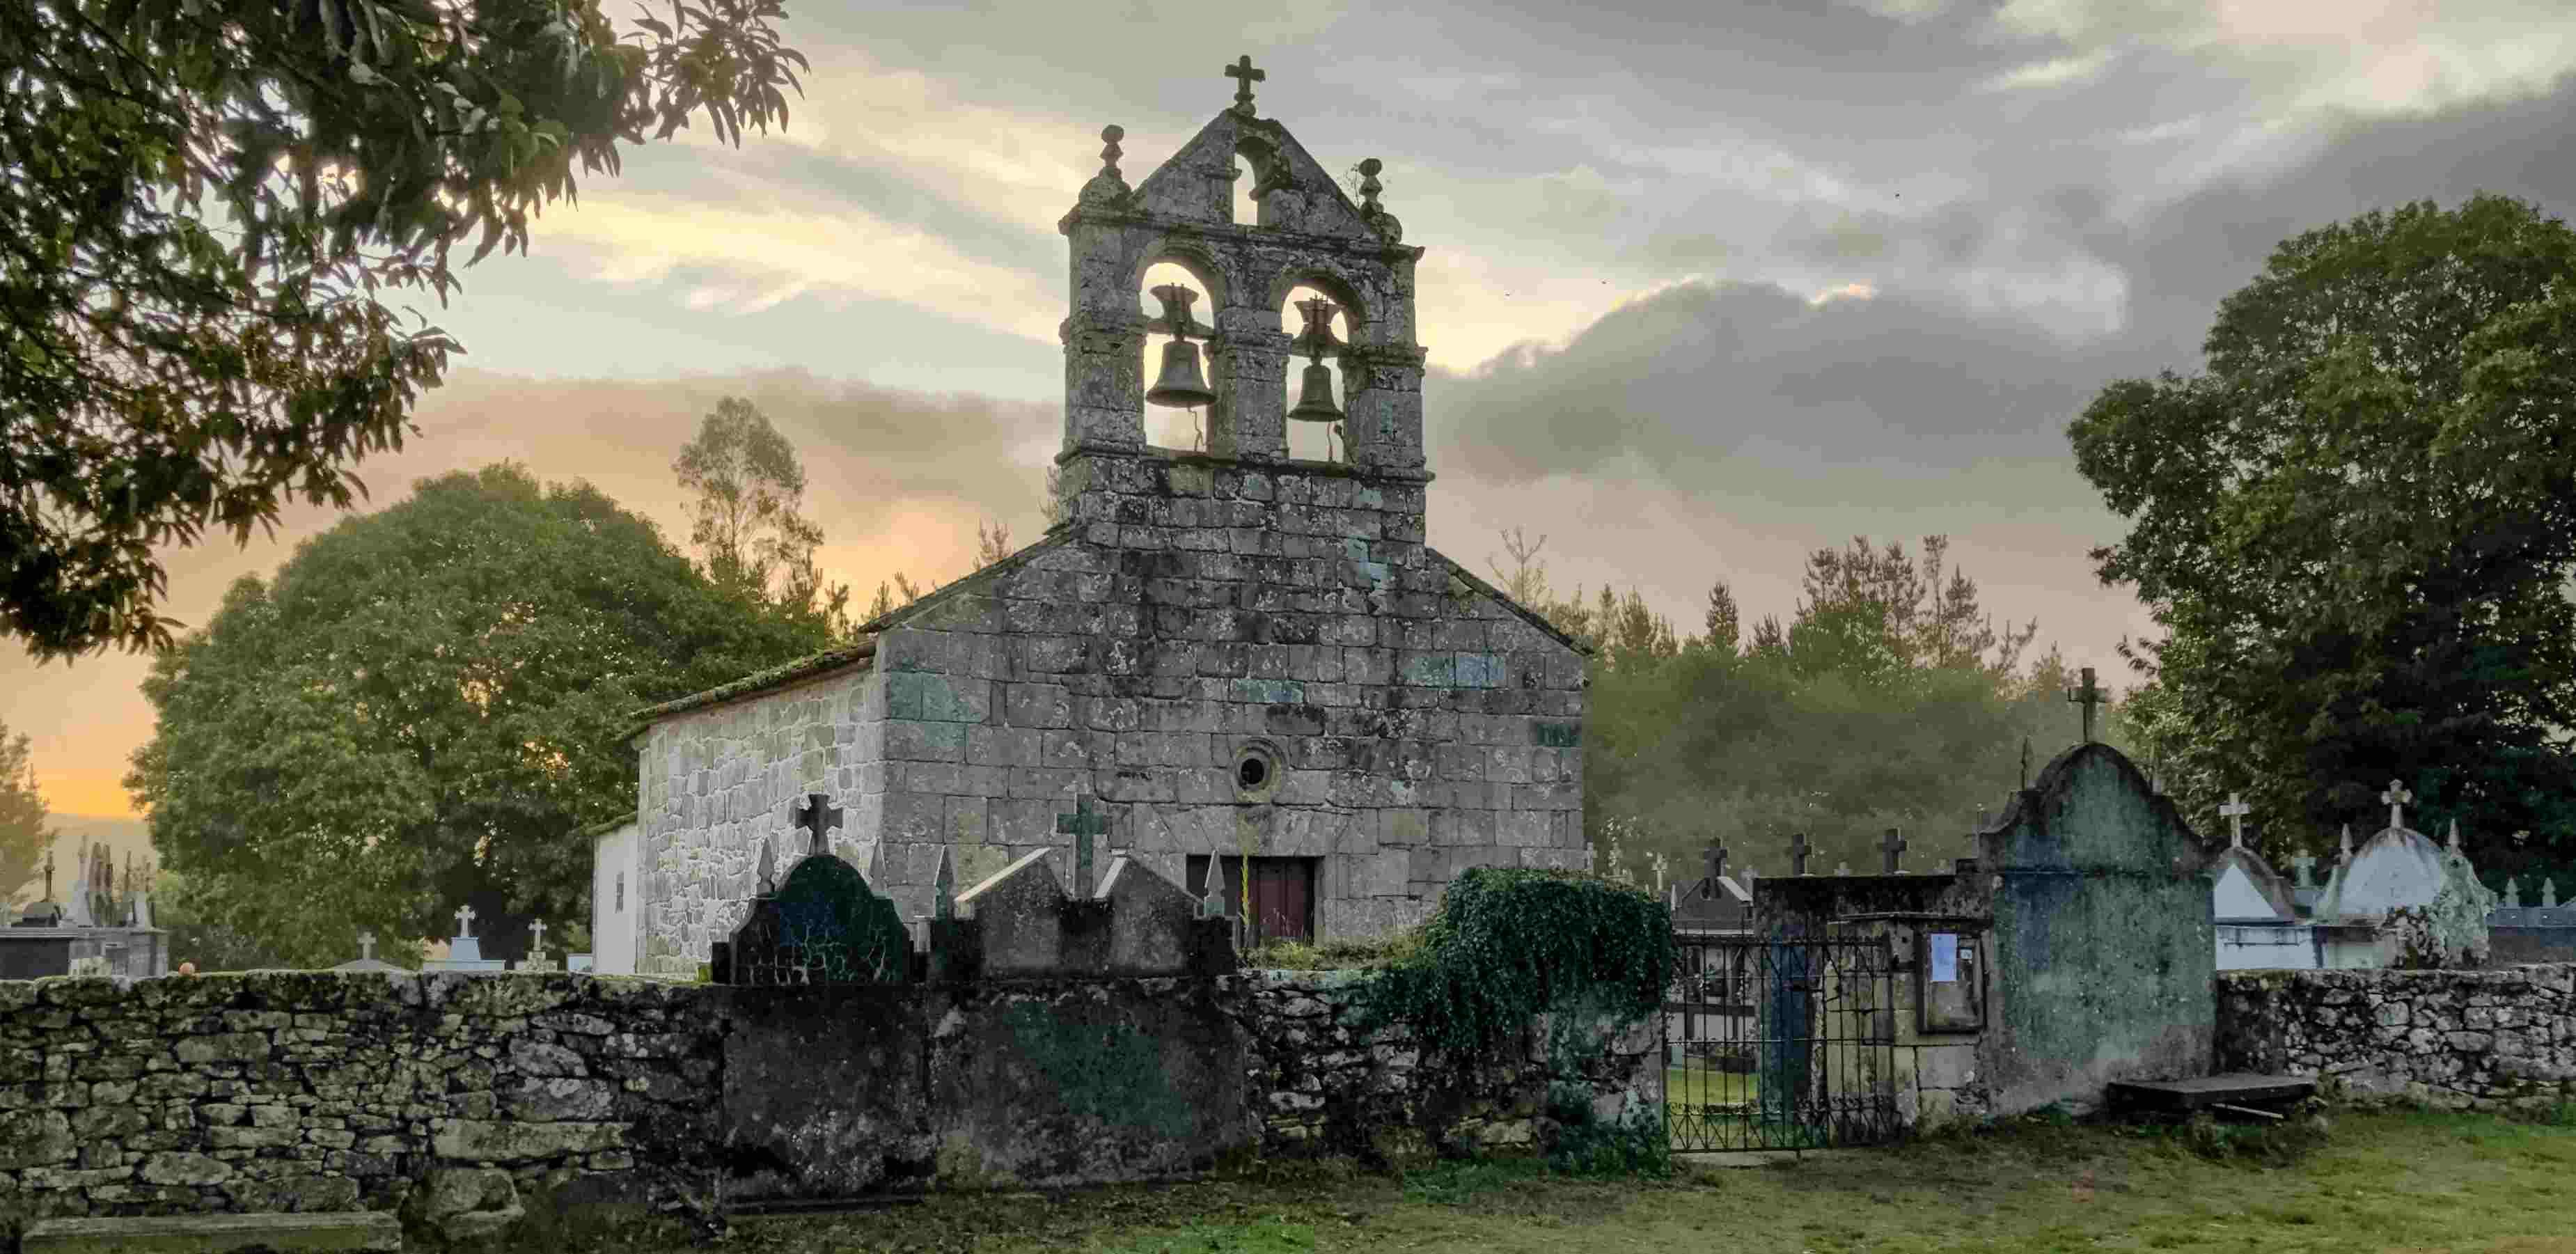 Mercadoiro's church in French Way